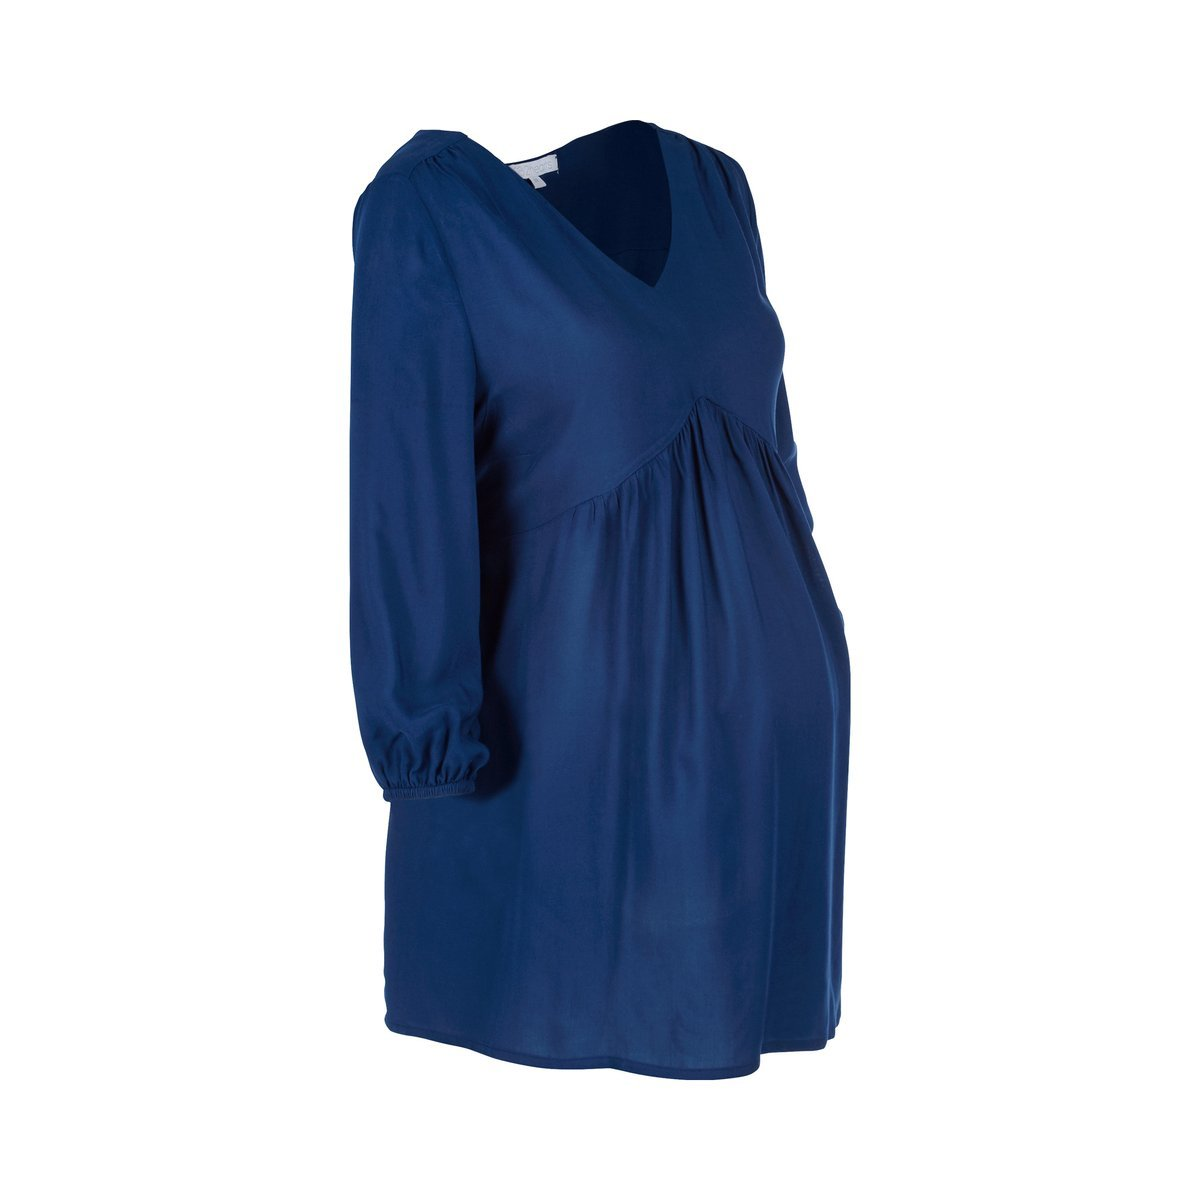 2HEARTS Umstands-Bluse V-Neck blau//Damen Umstandsmode//Schwangerschaftsmode//Bluse f/ür werdende Mamas